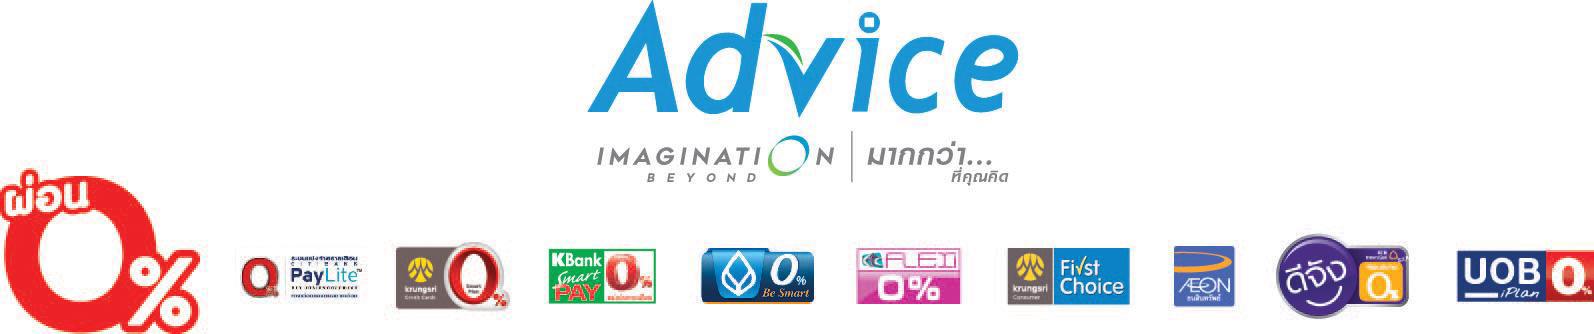 AdviceCM-03